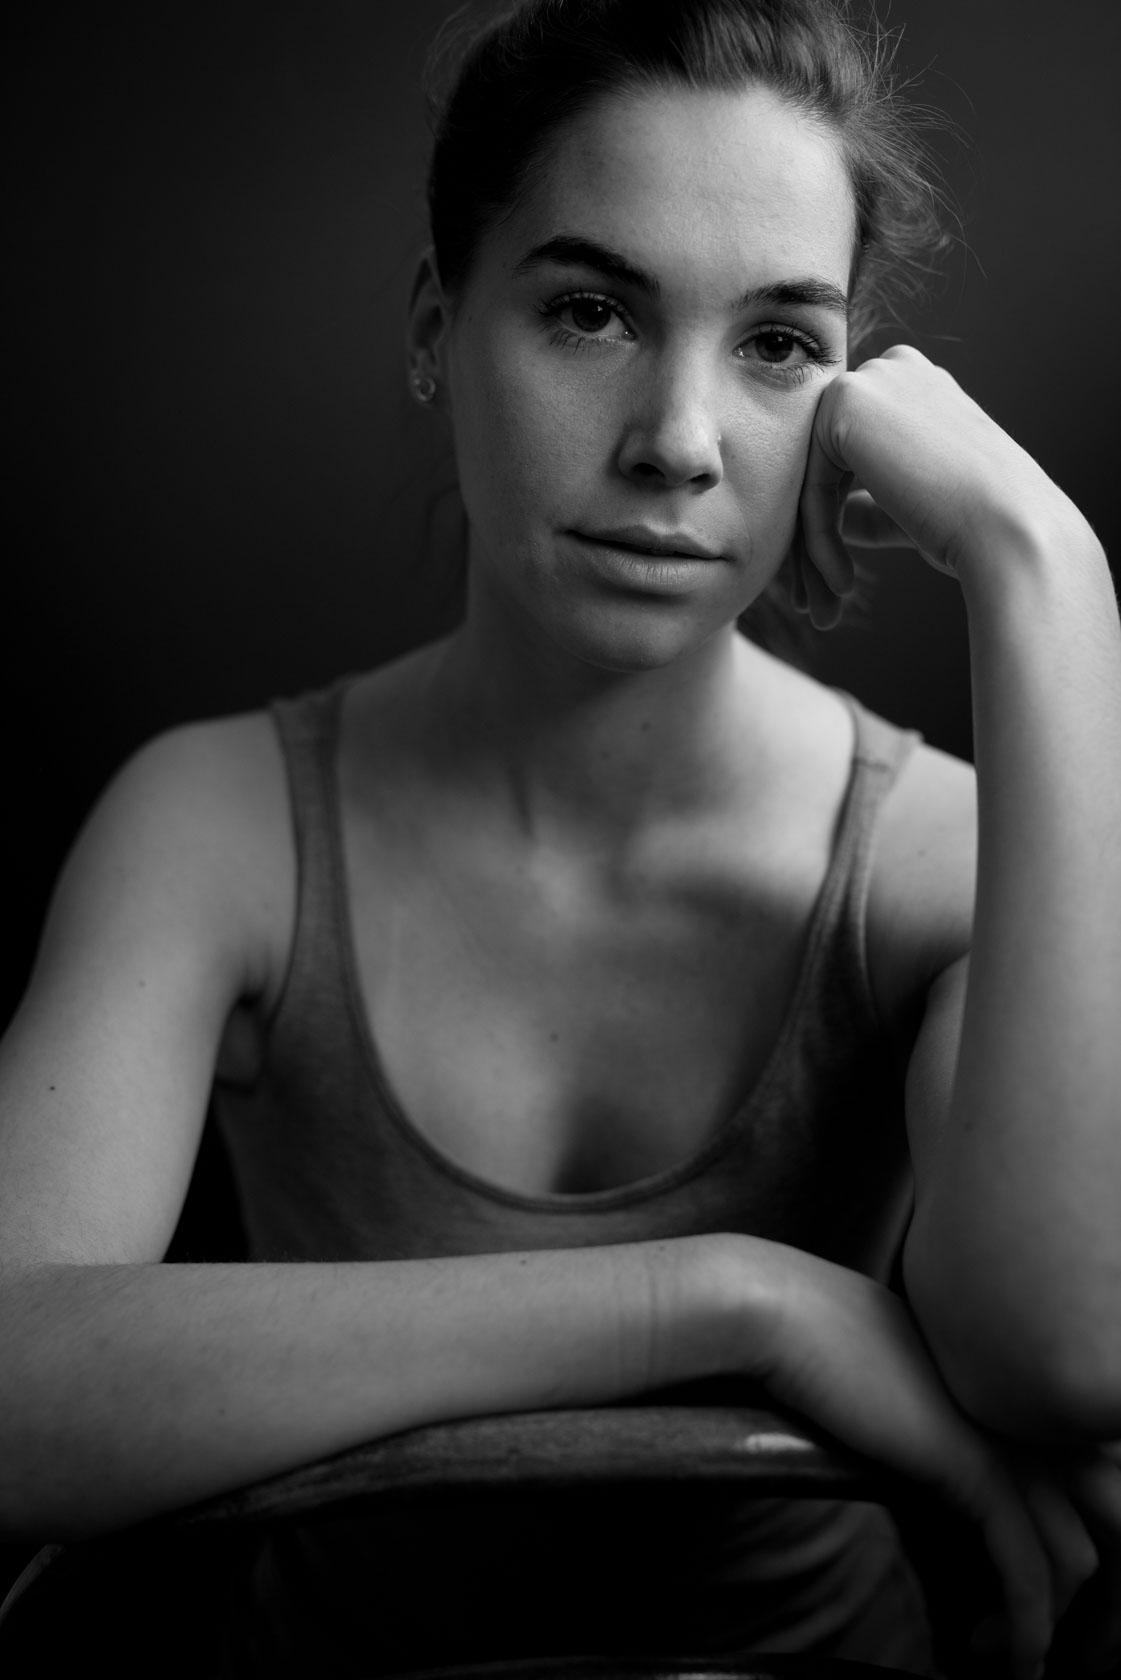 https://www.stefanhill.net/wp-content/uploads/2017/05/Portraitfotograf-Waiblingen-Stuttgart-Schorndorf-Fotoshooting_0002.jpg